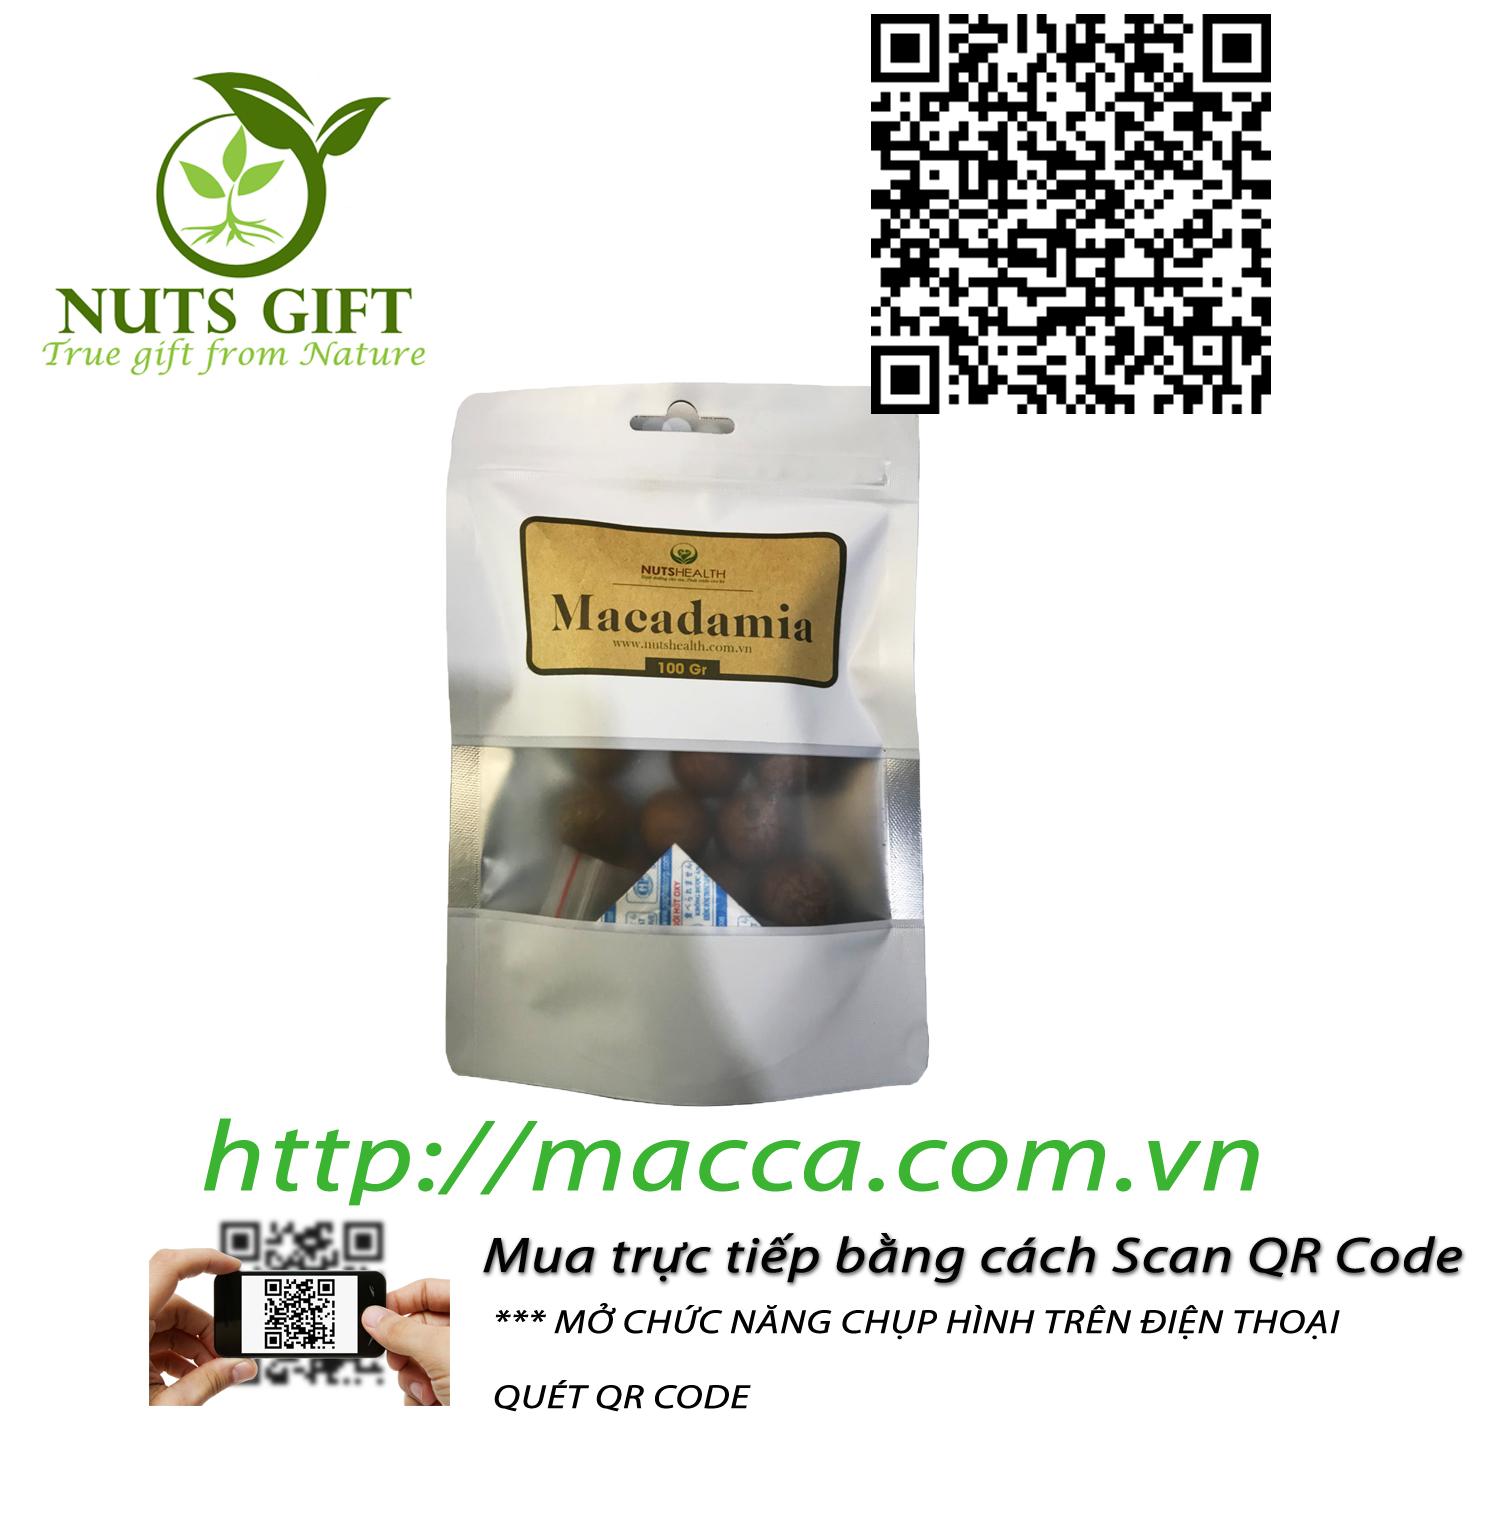 HẠT MẮC CA MACCA ÚC – NUTSHEALTH – 100 GR